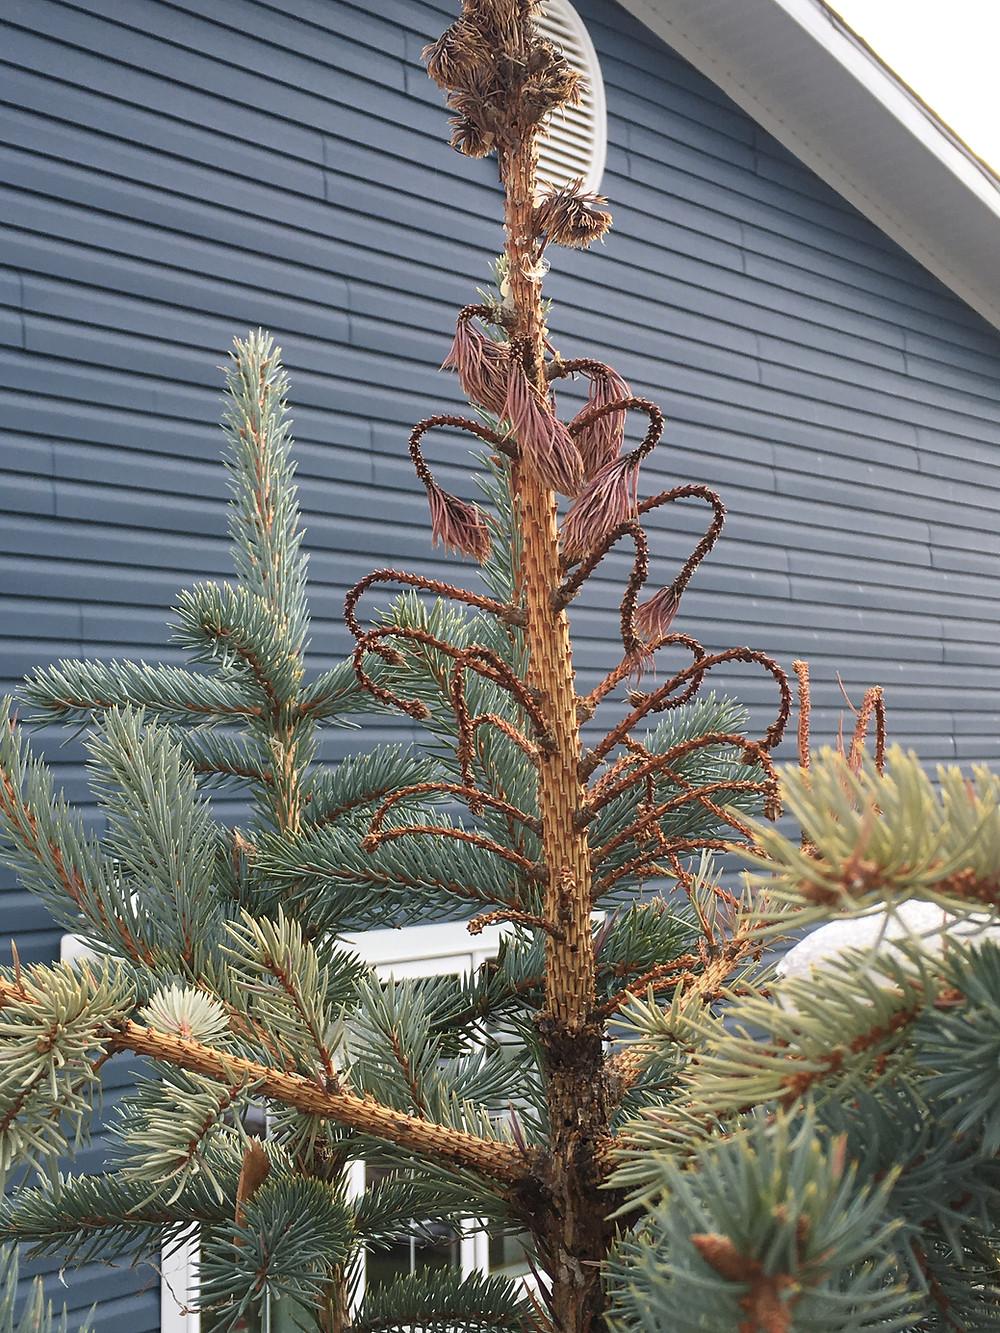 Spruce Weevil: LaRueTree Certified Arborists